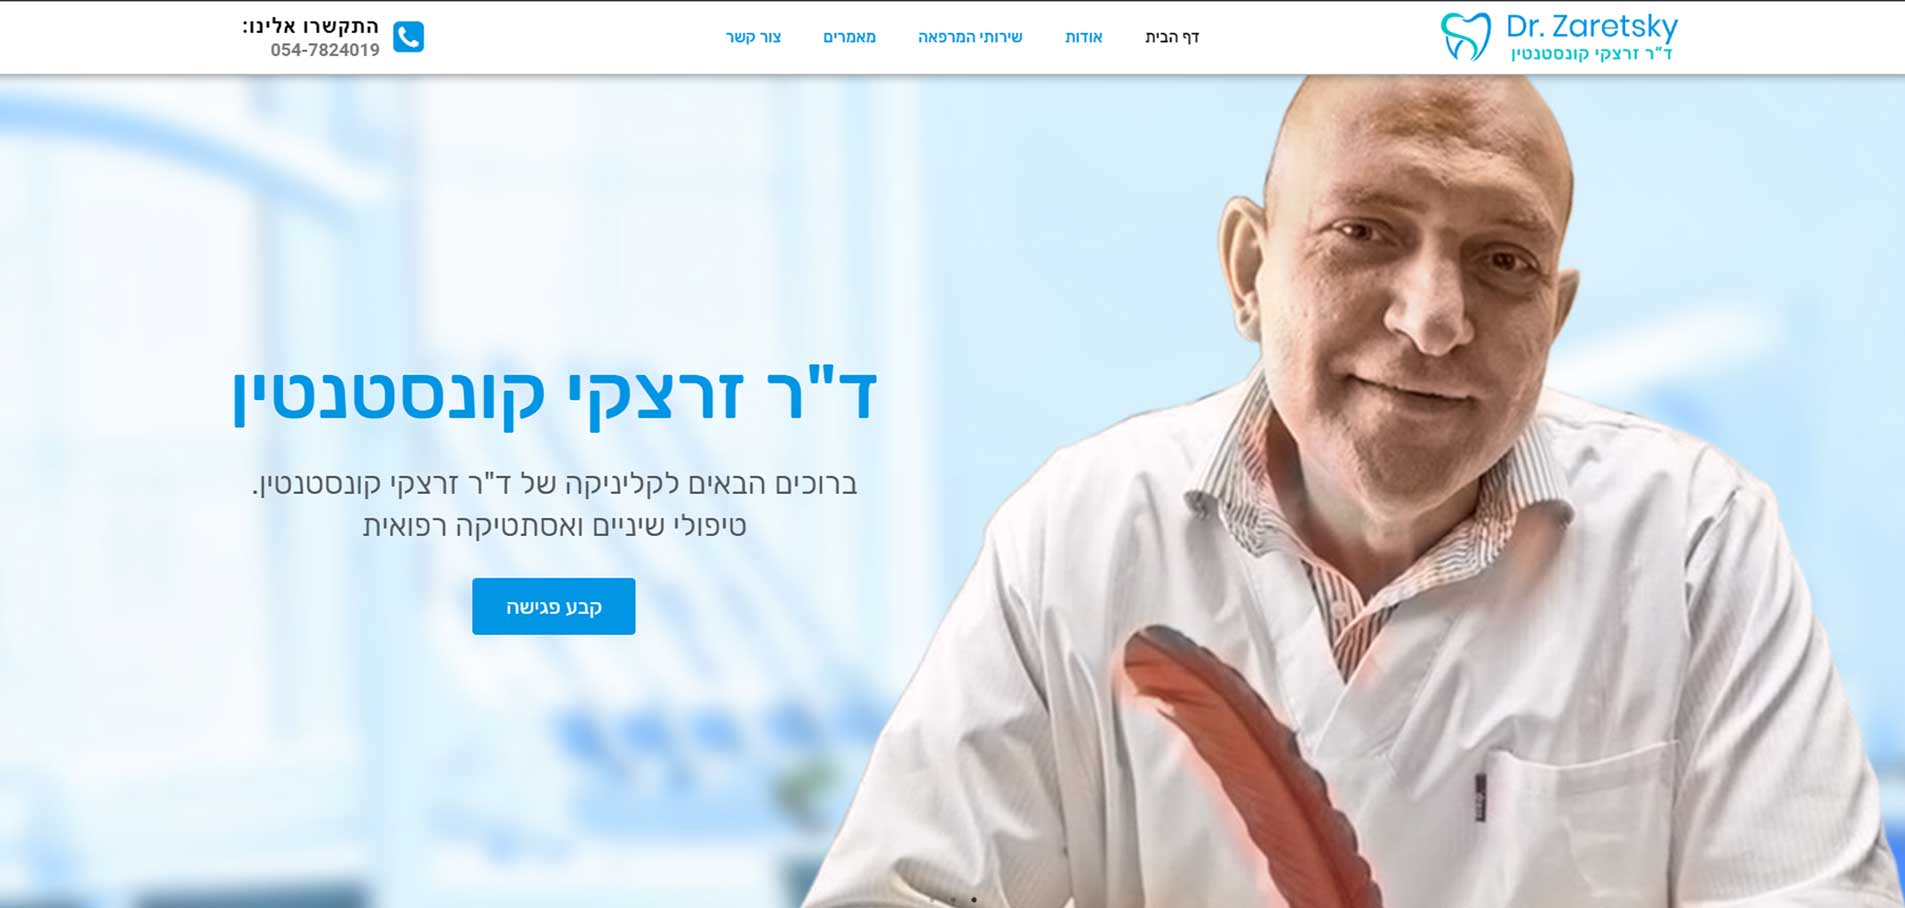 Dr. Zaretsky home page